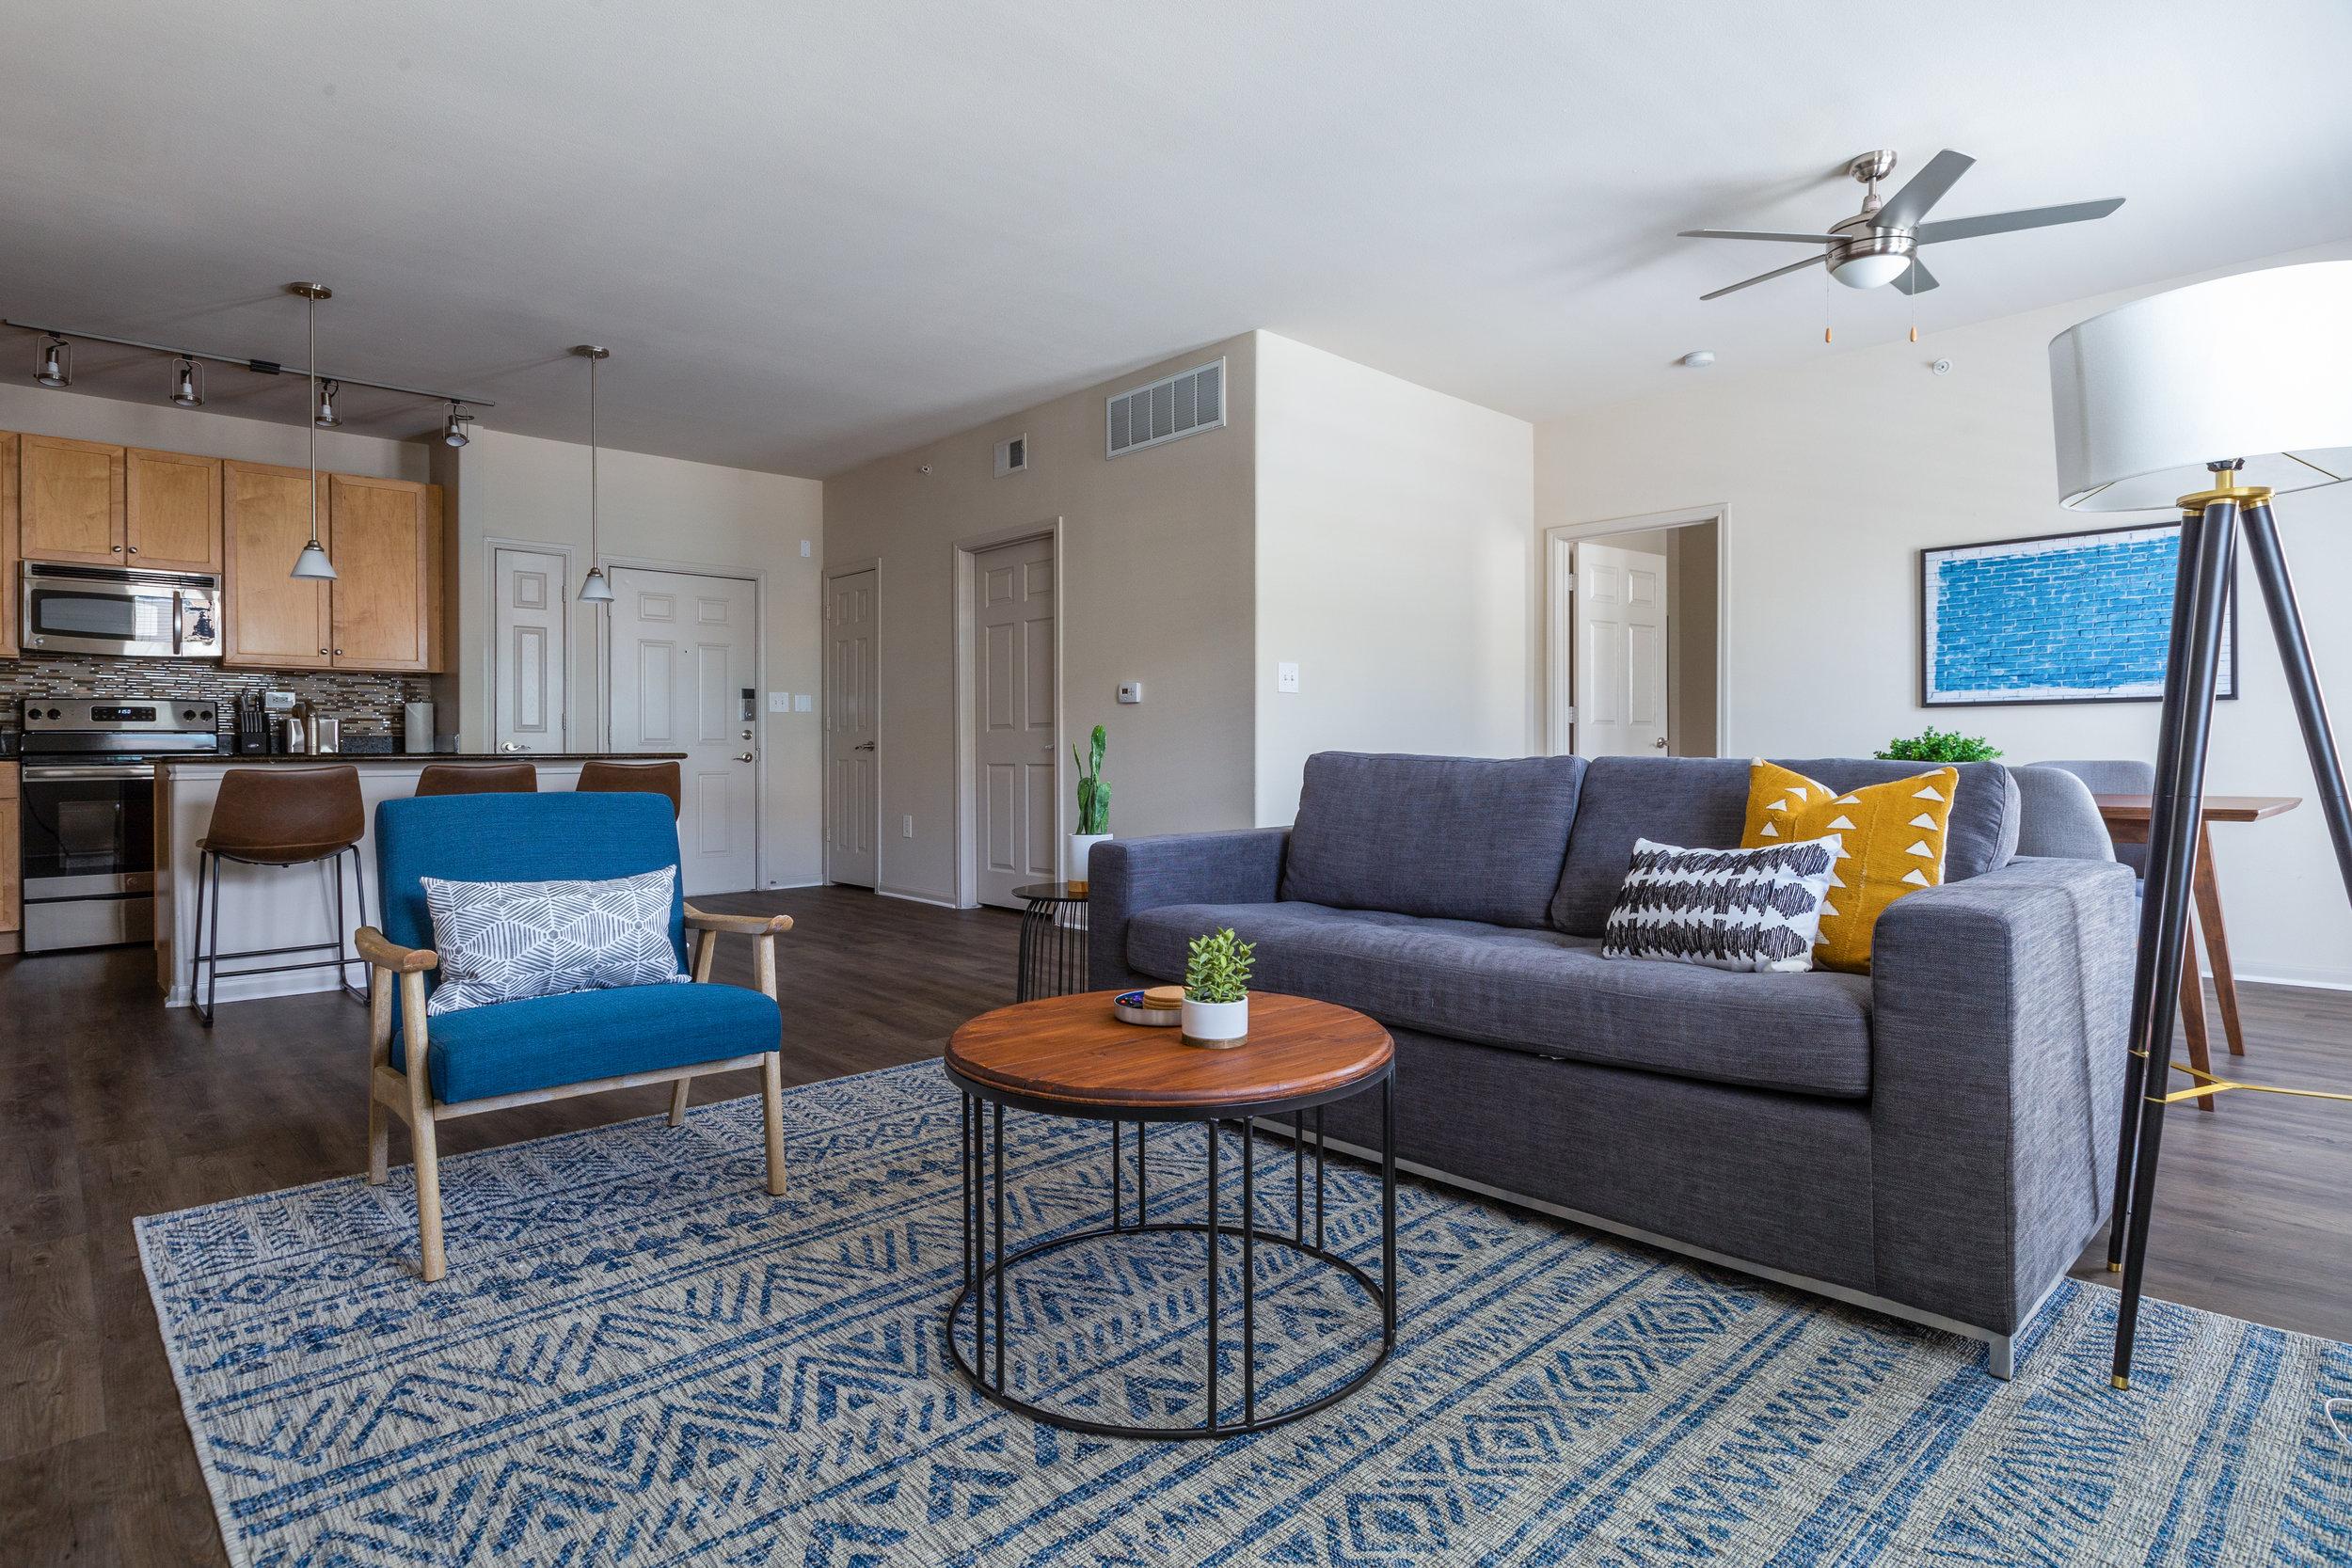 Hip-Austin-Living-Room-Interior-Designer-Love-Ding-Locale-Behind-The-Scenes-Blog.jpg